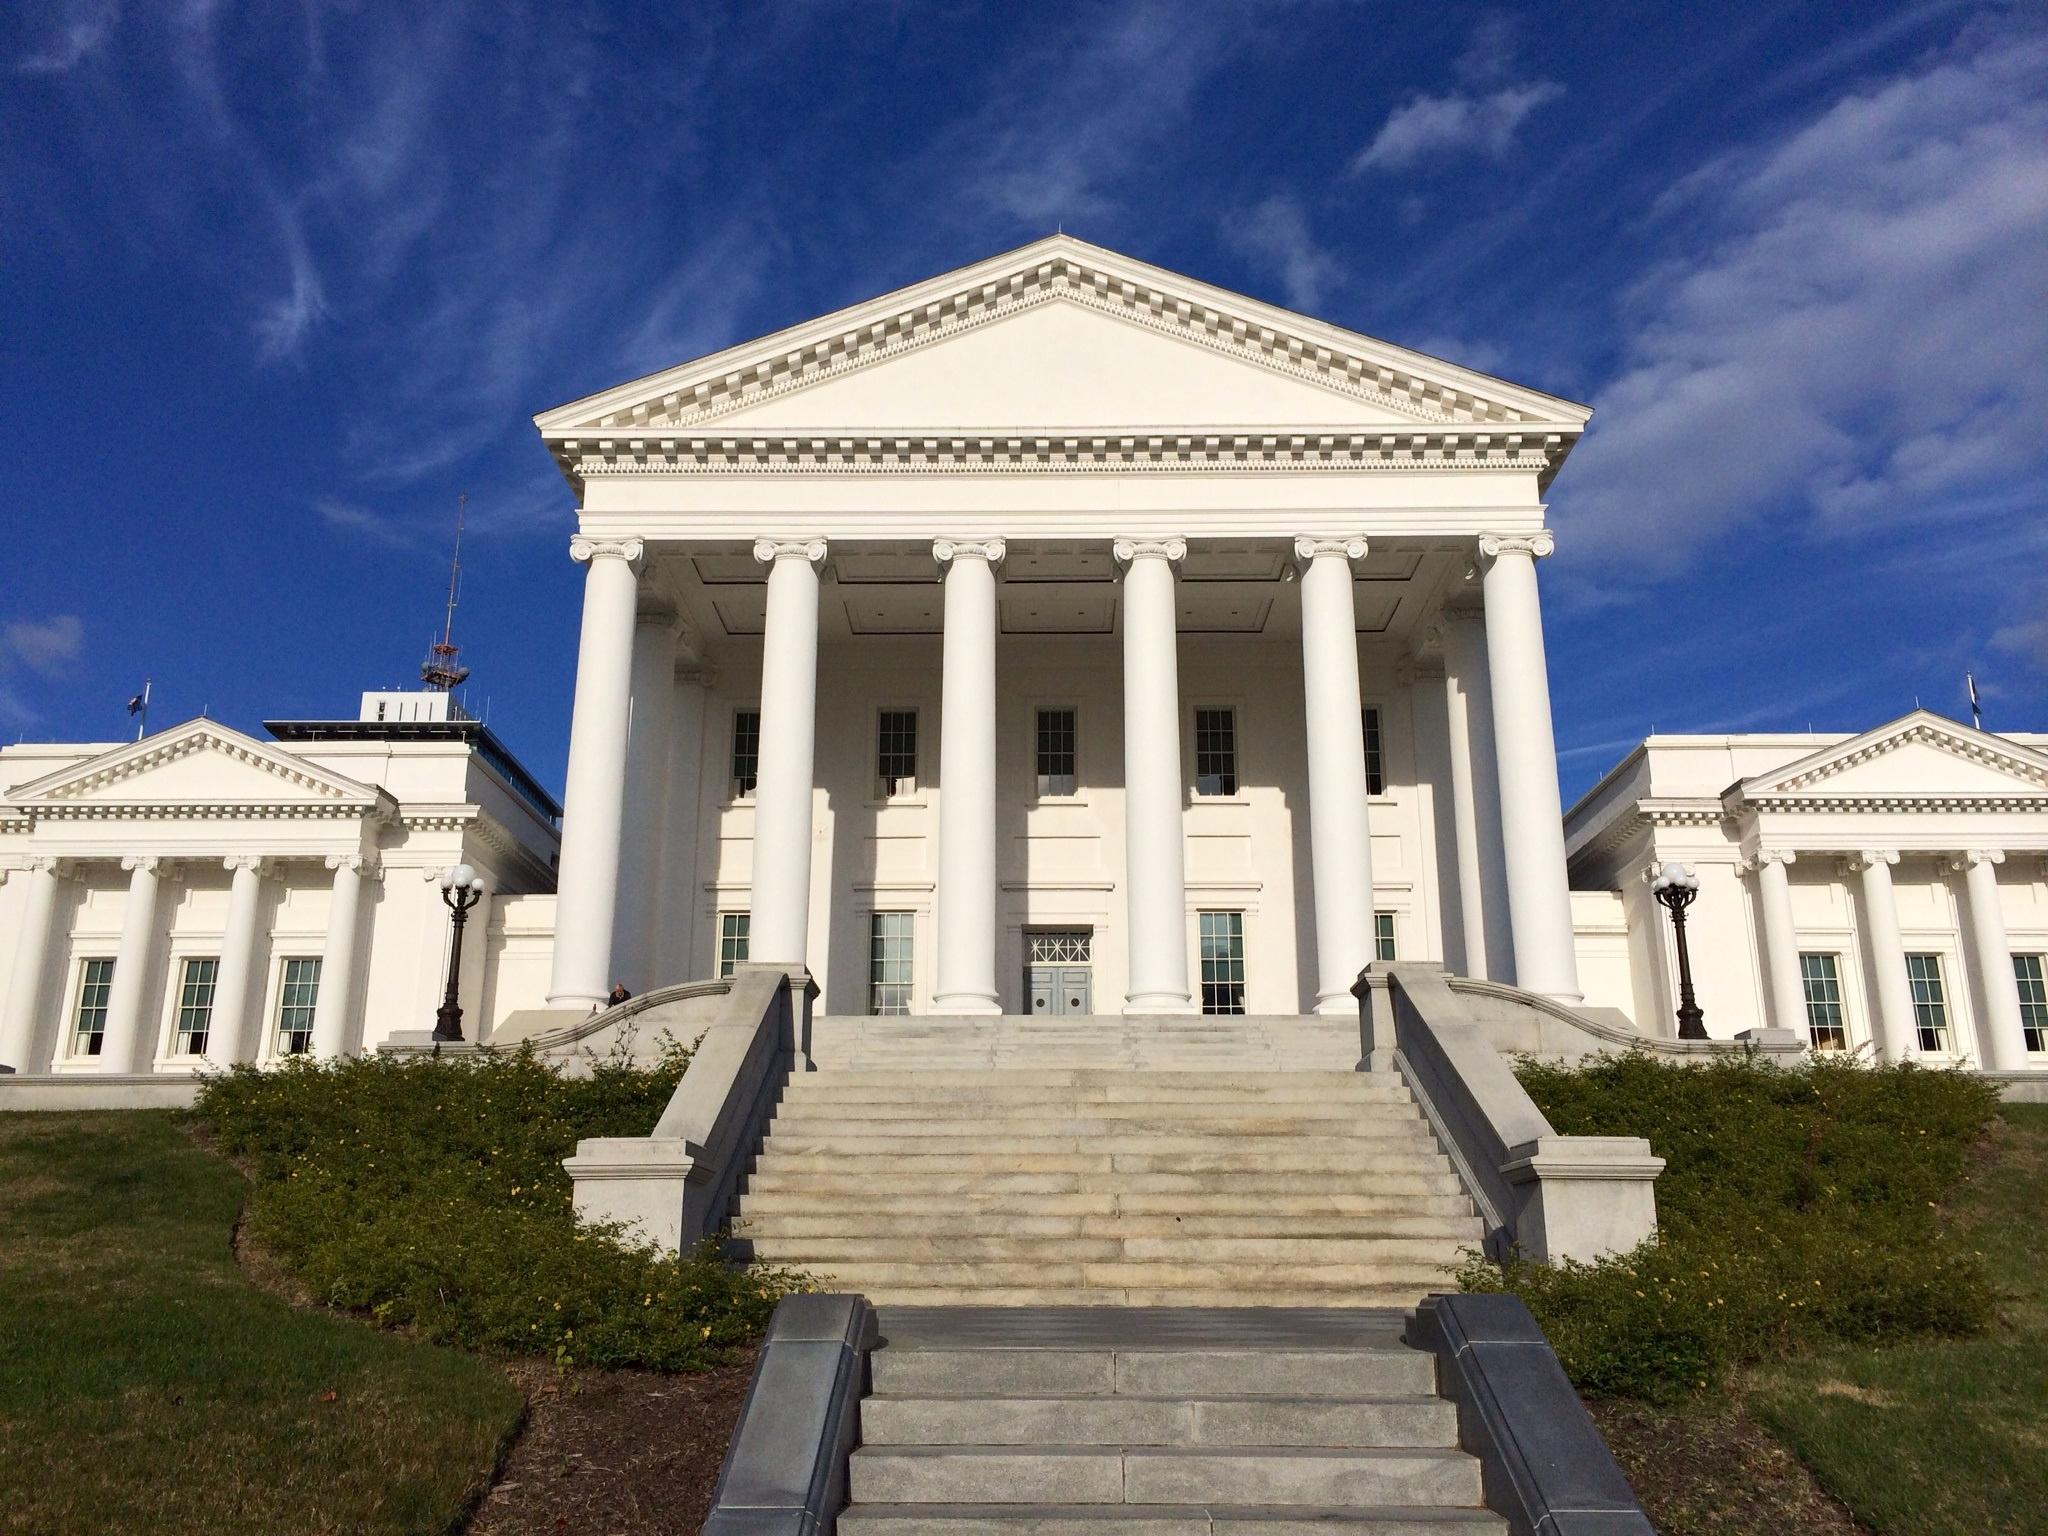 Richmond - Стили архитектуры США